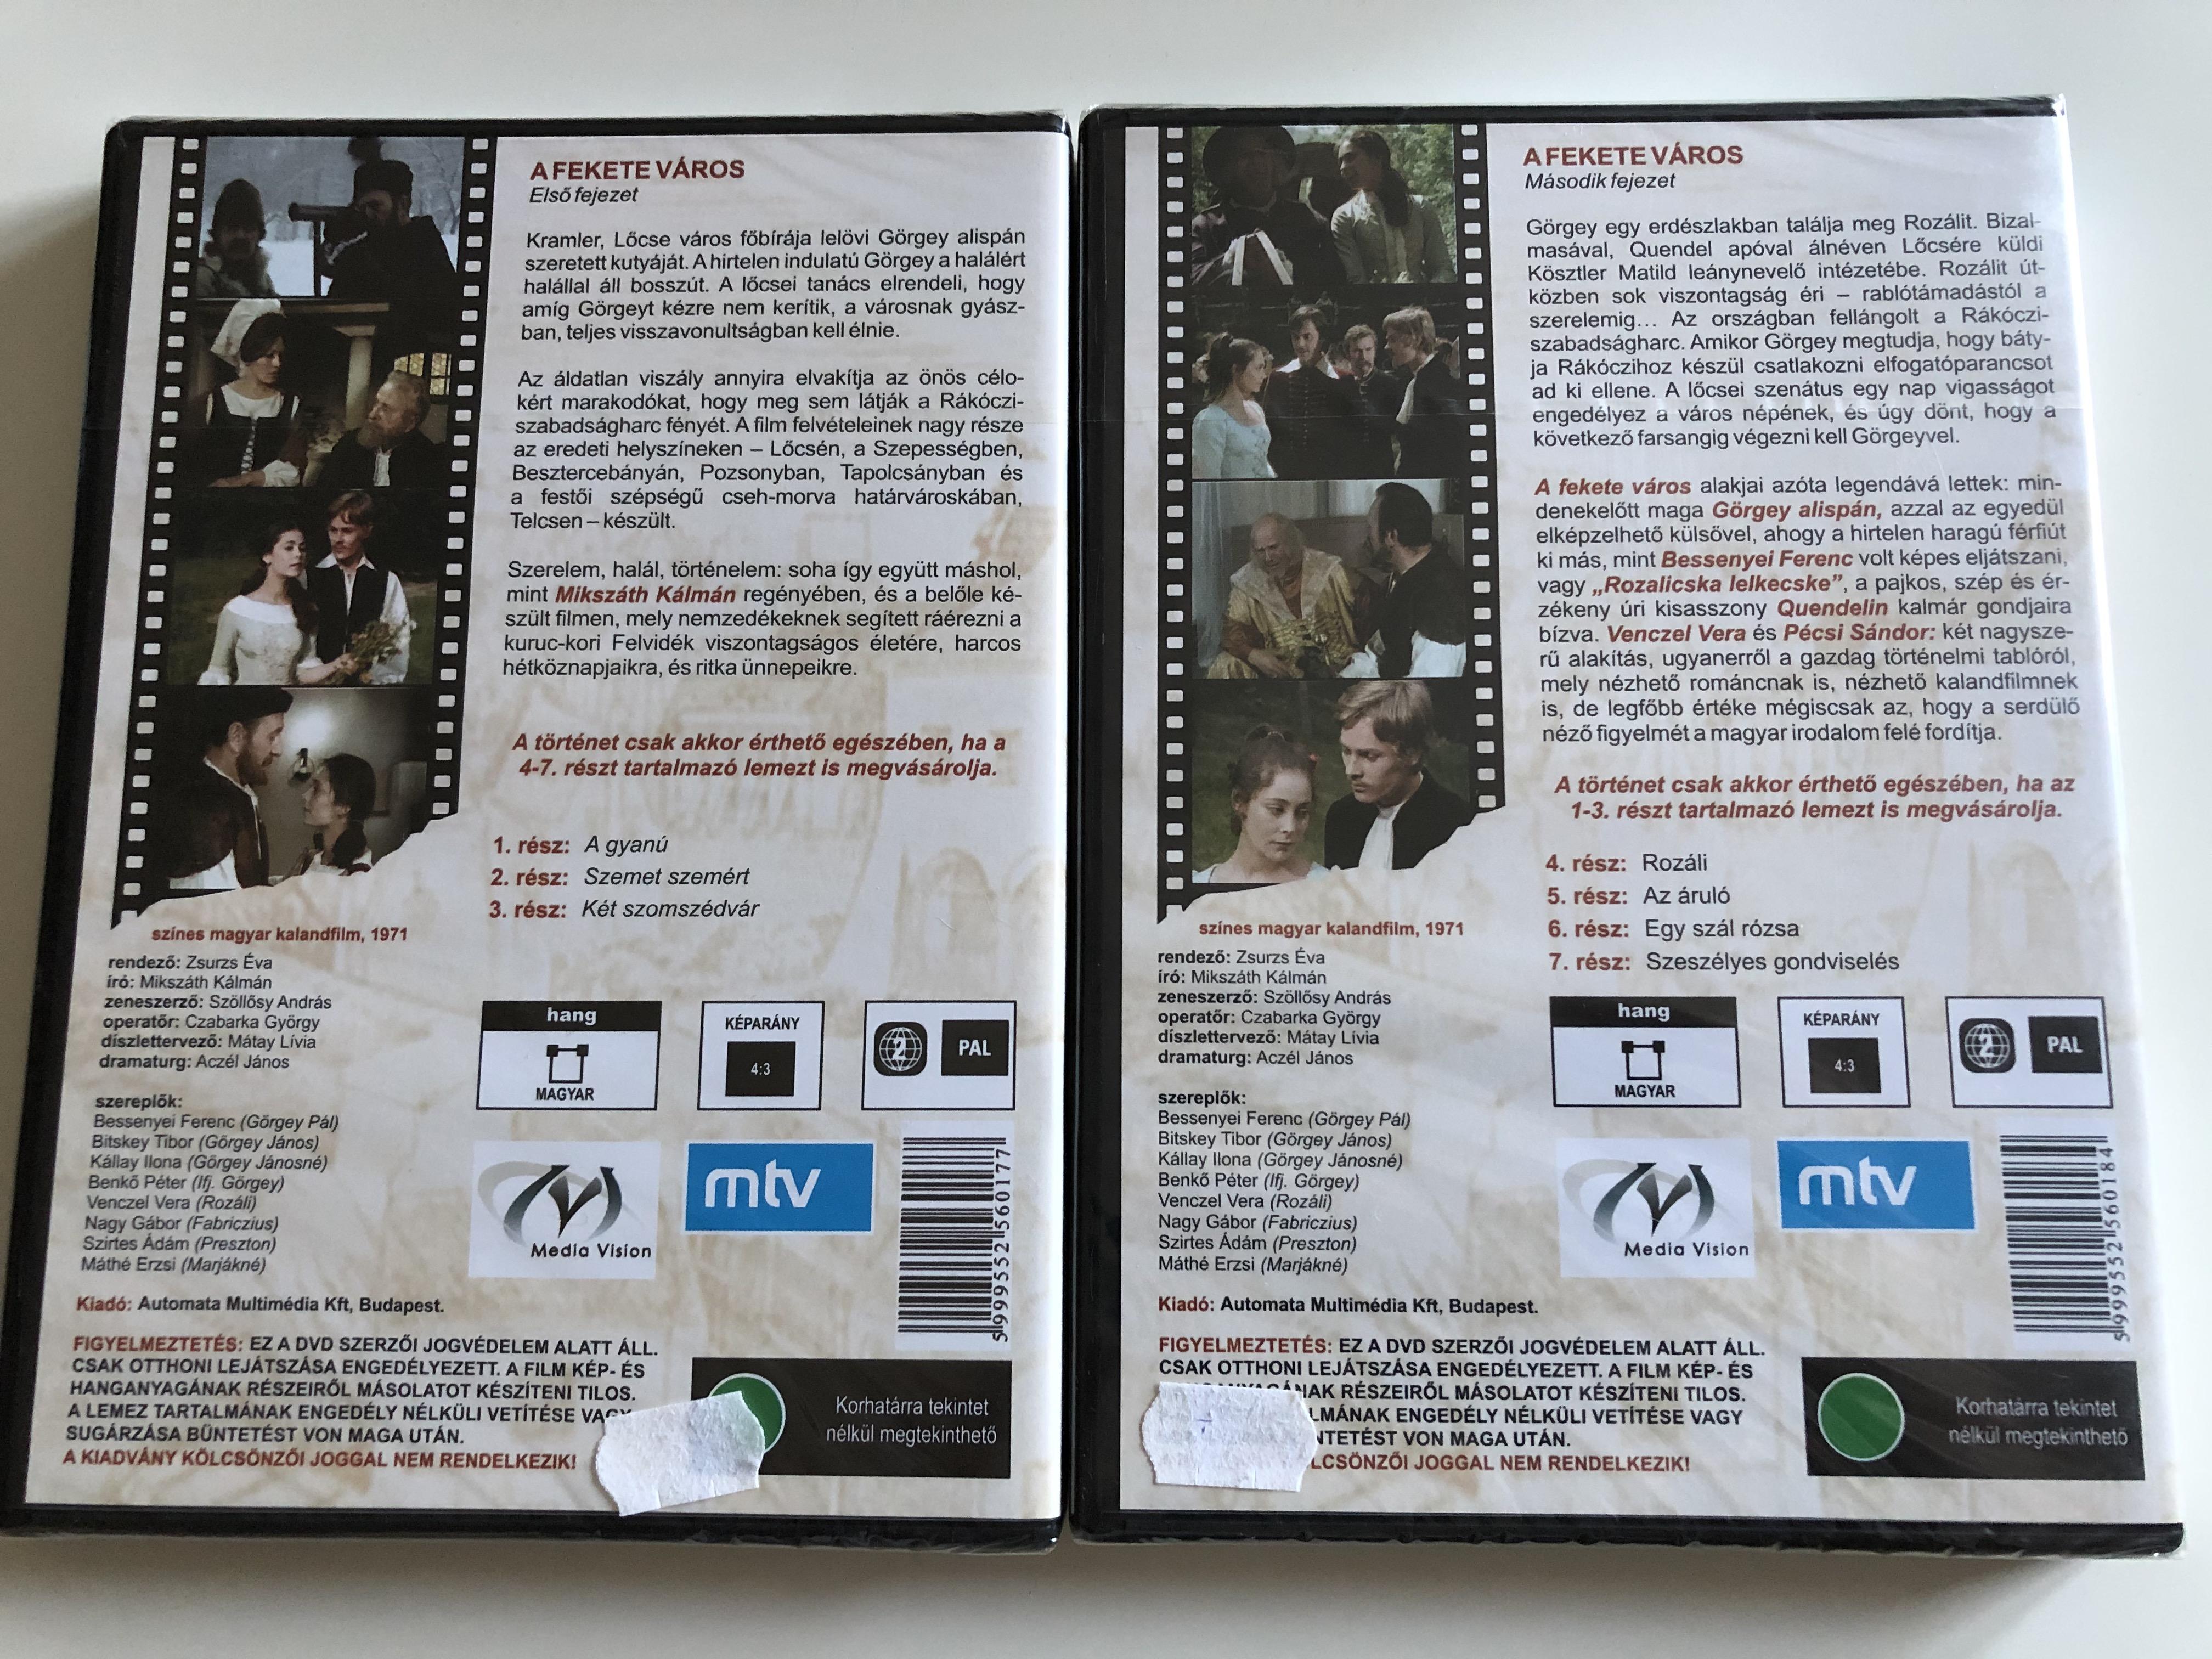 a-fekete-v-ros-i-ii.-dvd-set-1971-1-7.r-sz-the-black-city-1-2.-episodes-1-7-2.jpg